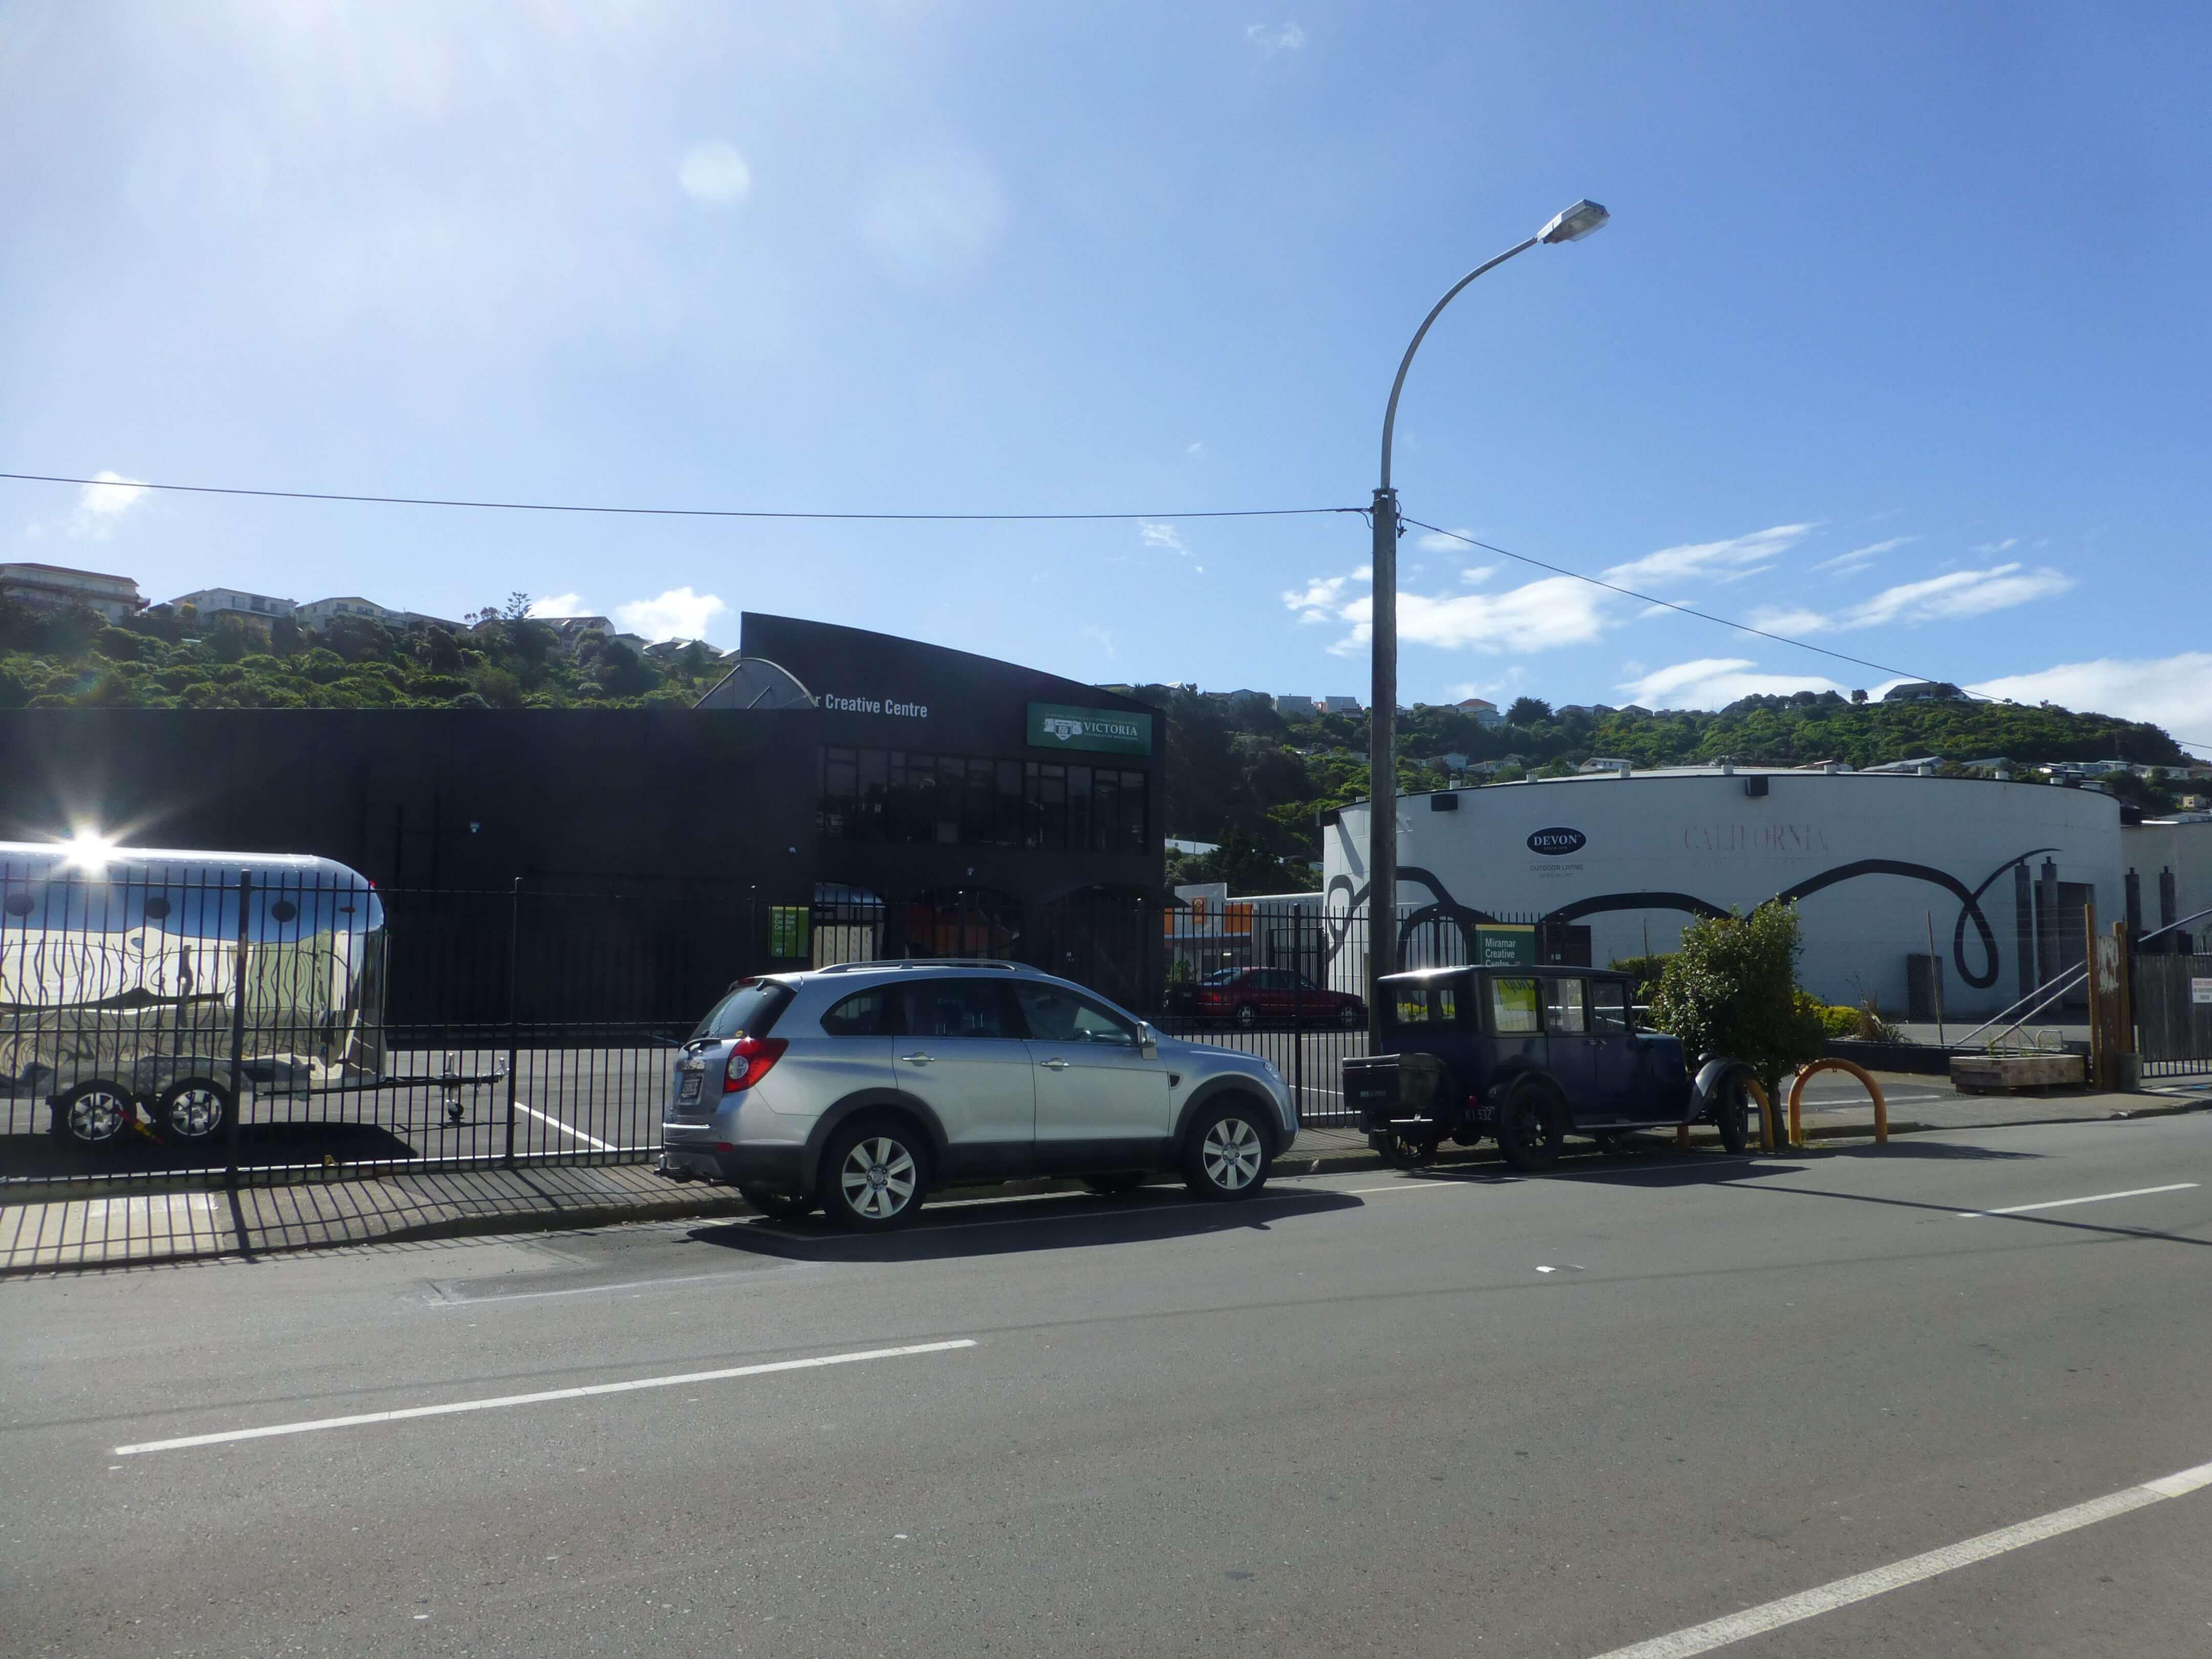 Wellington, in Miramar auf dem Weg zum Weta Shop, Weit-weg.reisen 17